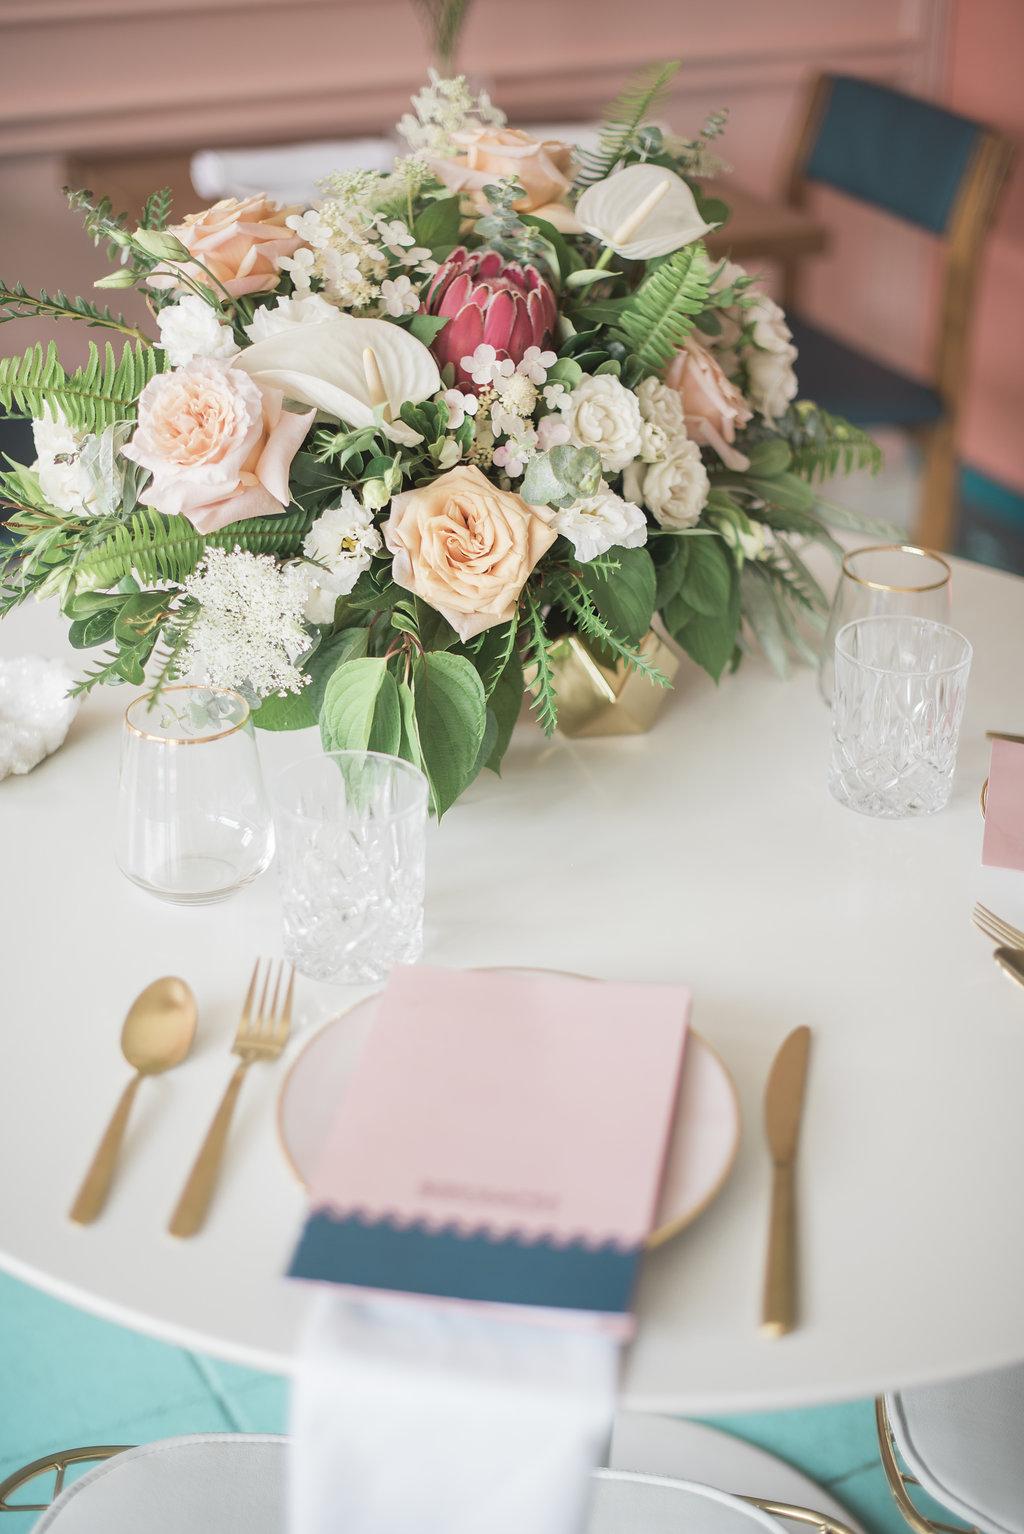 Motel-Restaurant-Editorial-Vineyard-Bride-photo-by-Blynda-DaCosta-Photography-014.JPG